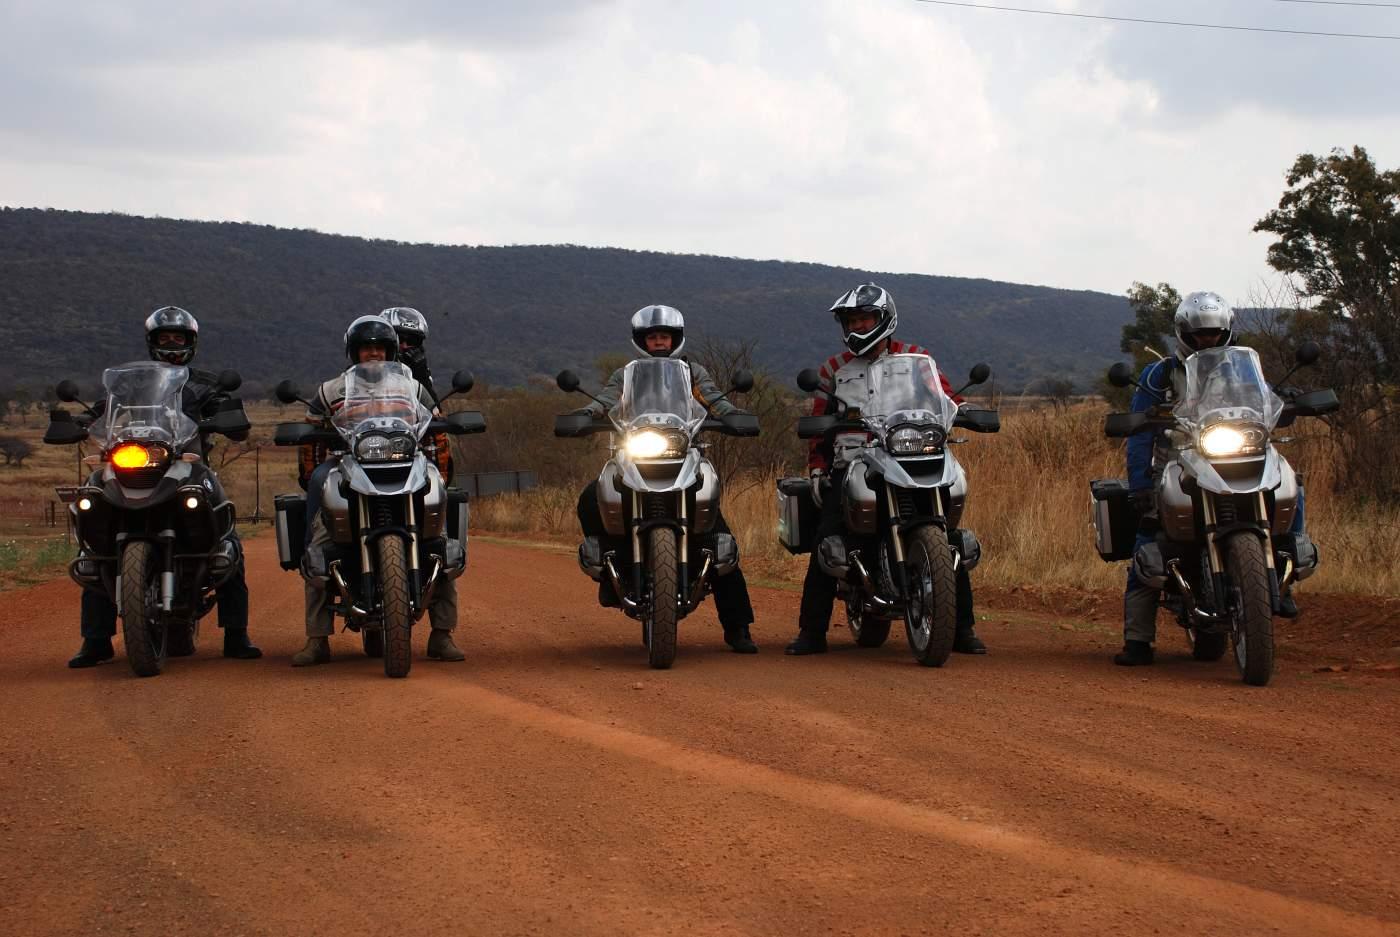 overcross motorradreise durch afrika die trans afrika. Black Bedroom Furniture Sets. Home Design Ideas